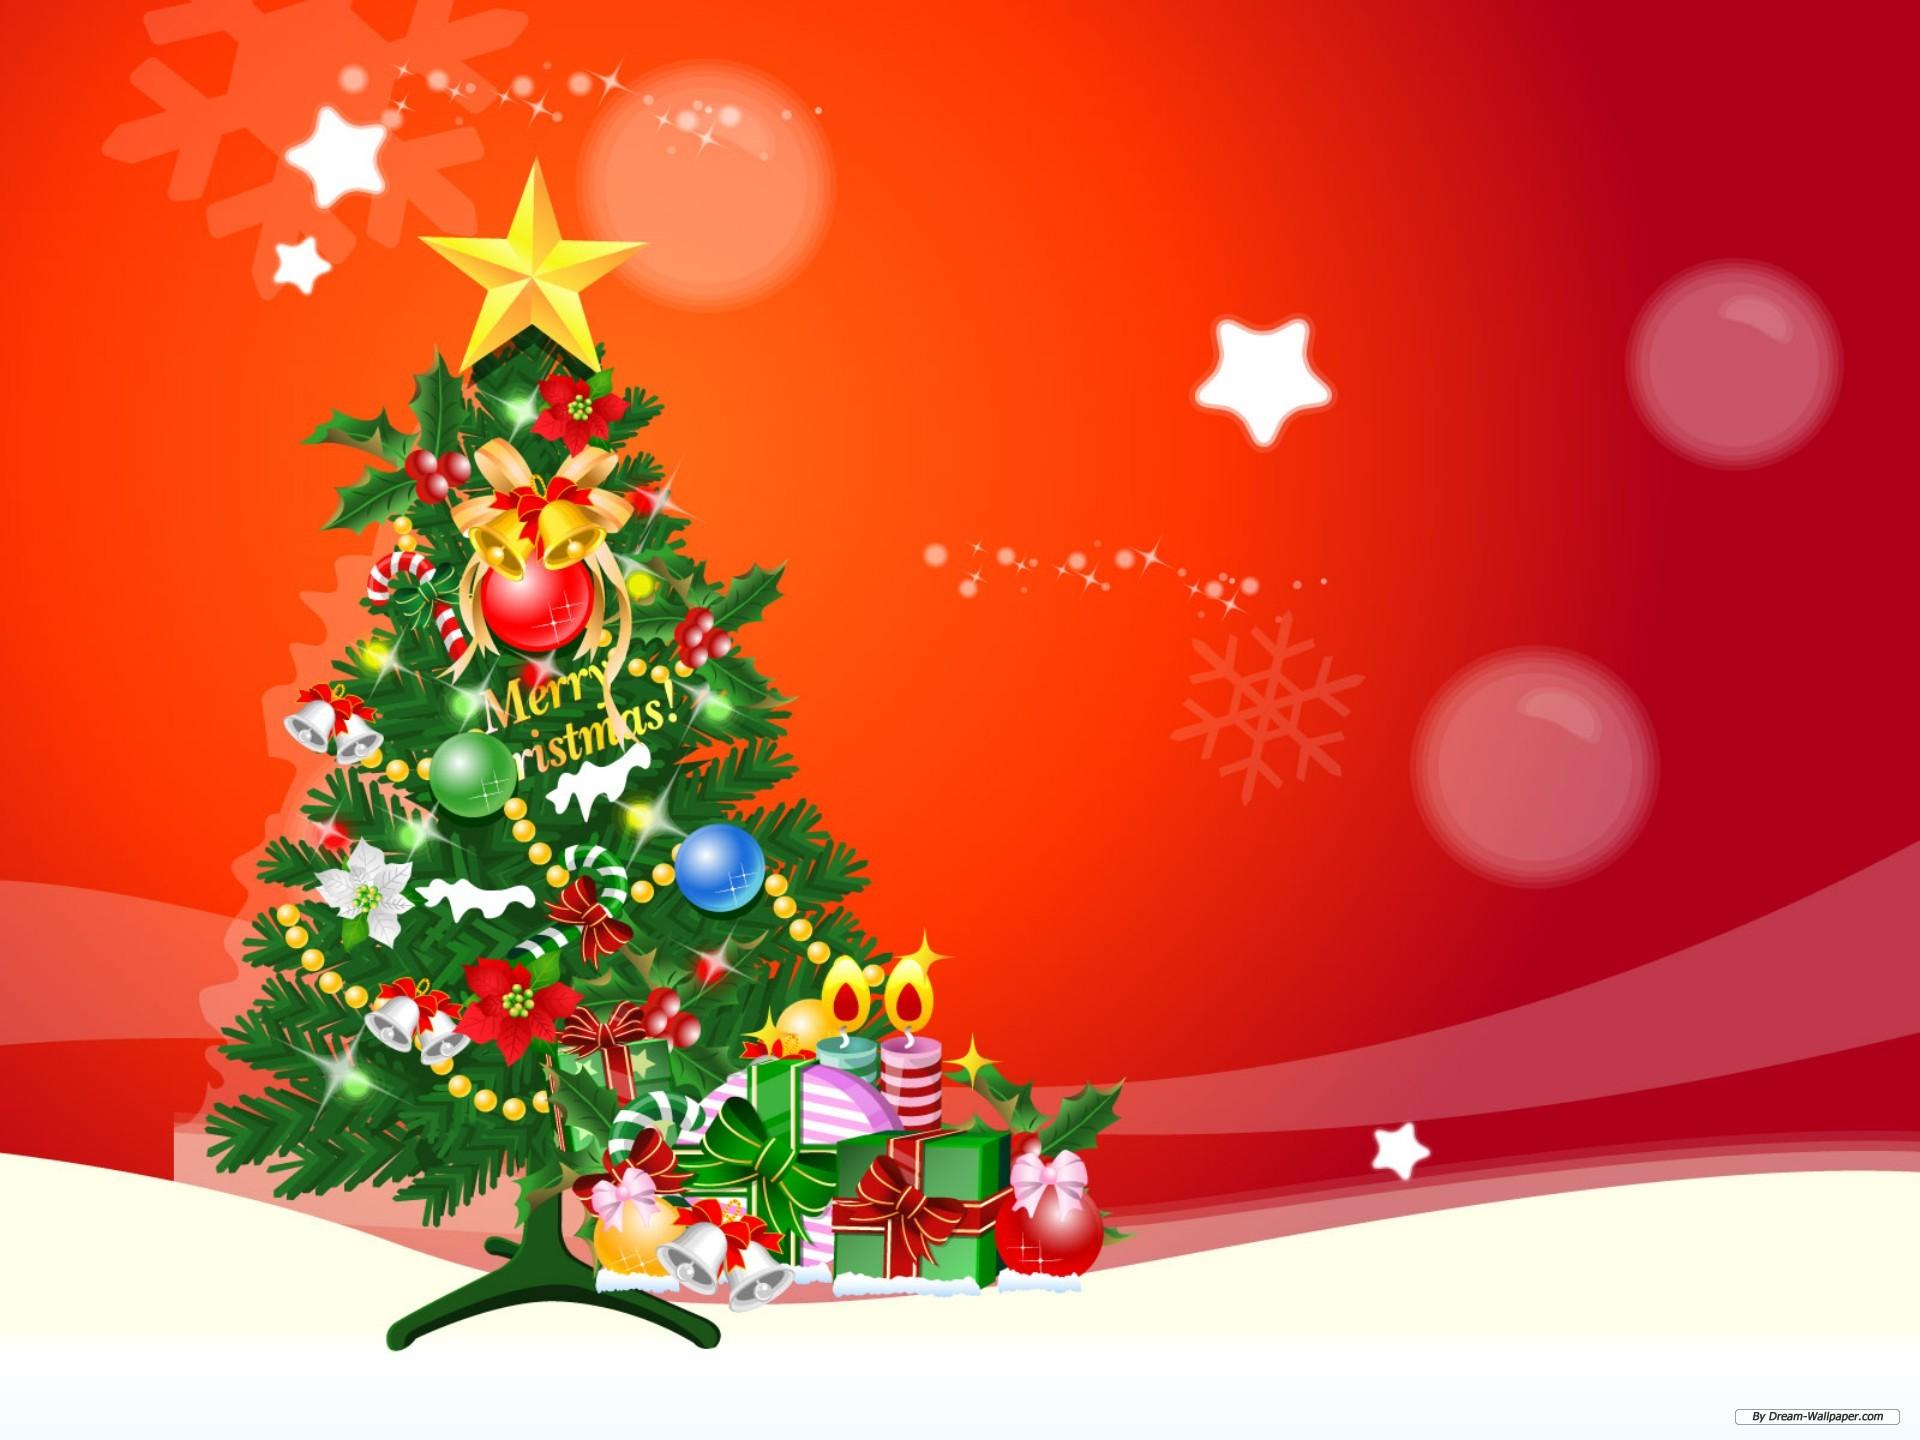 Holiday wallpaper Christmas theme 4 wallpaper 19201440 wallpaper 1920x1440